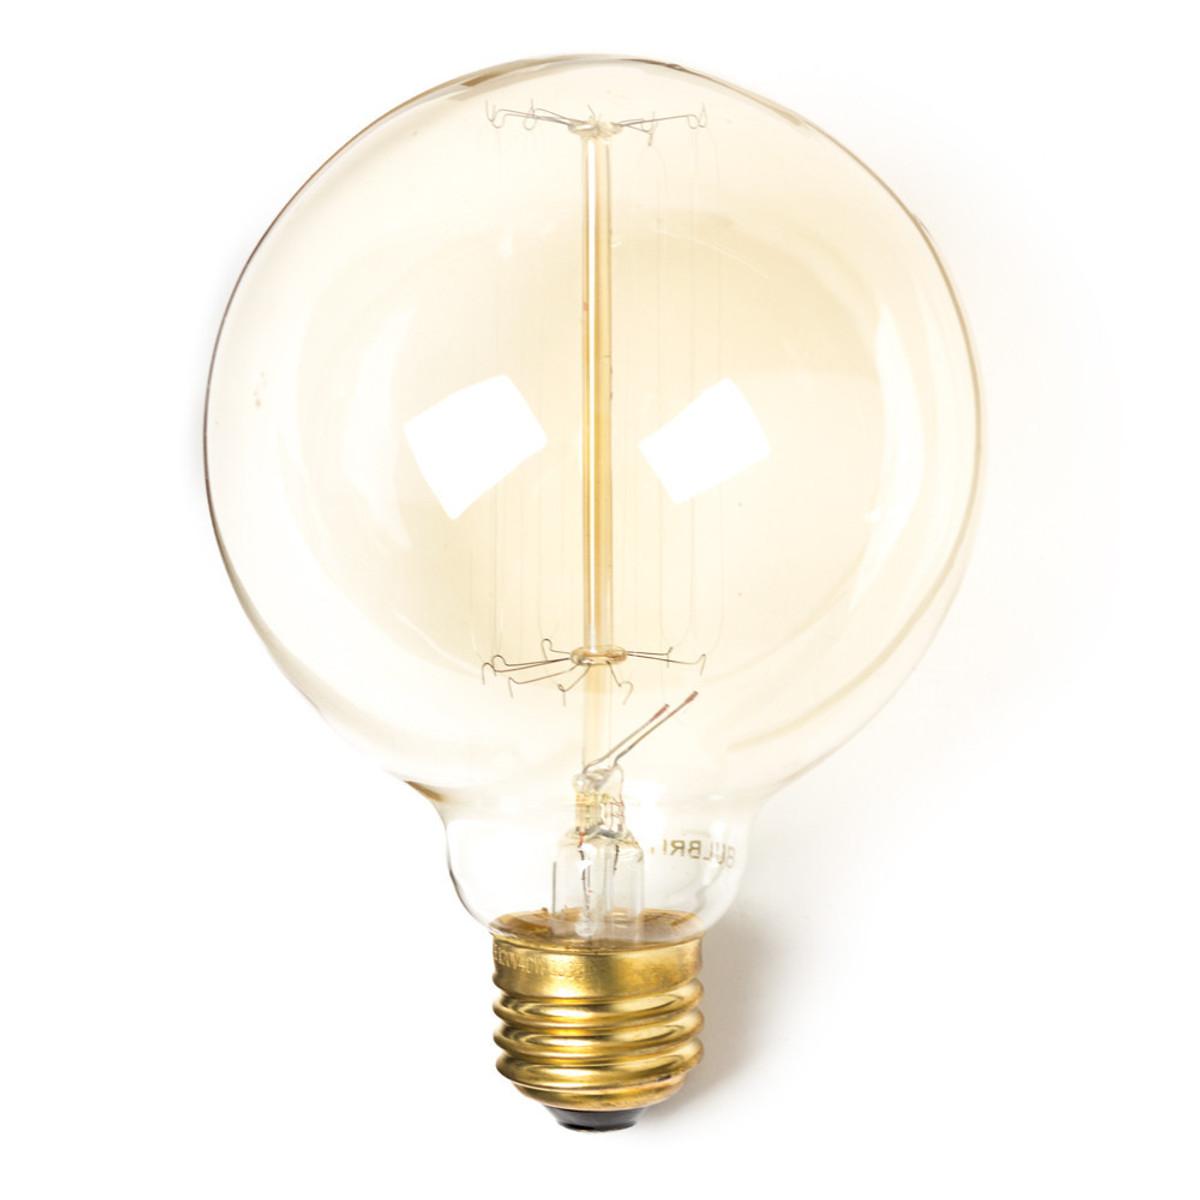 40 Watt Round Edison Bulb